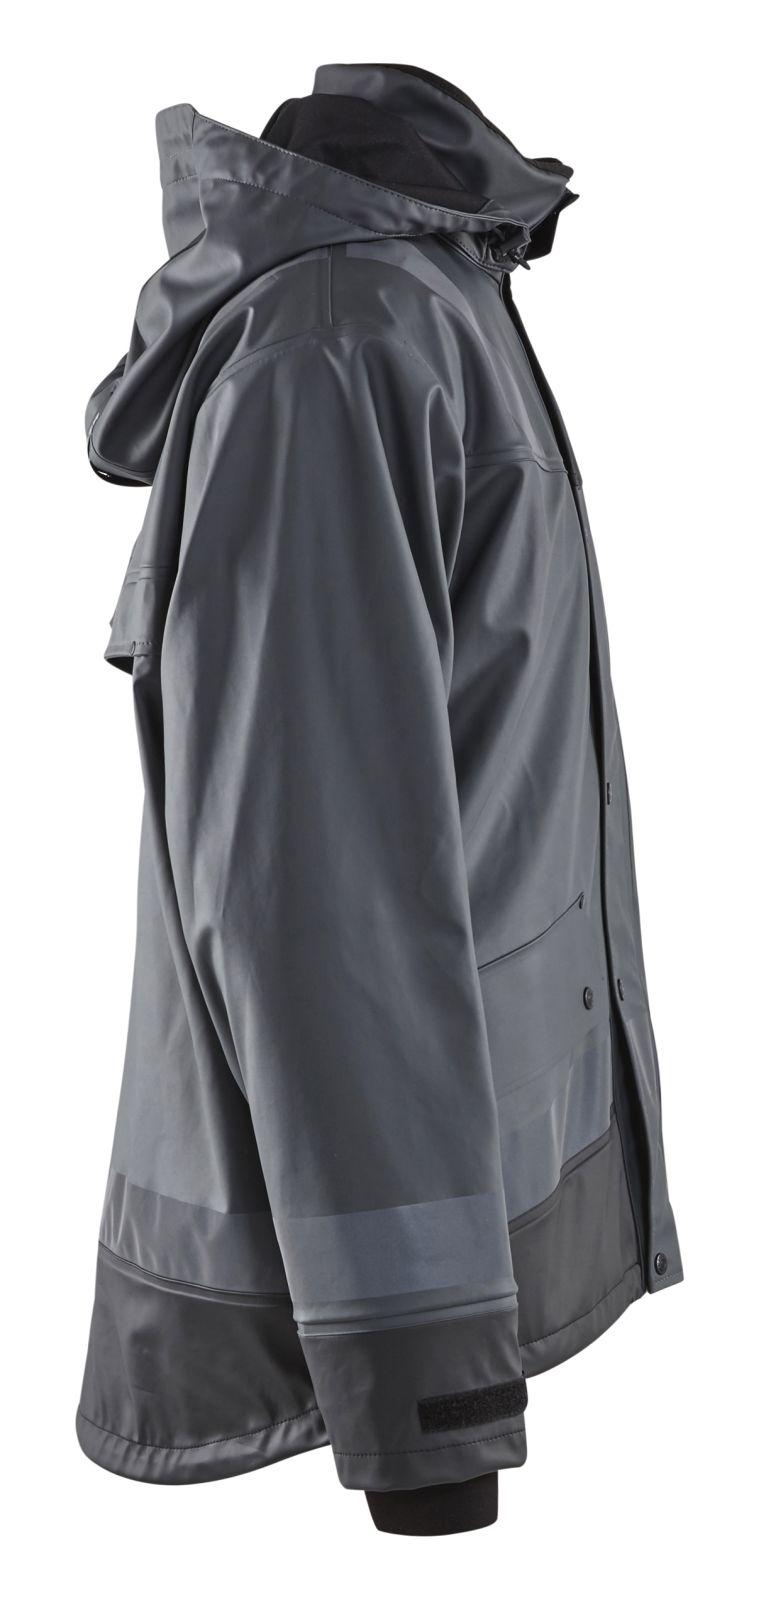 Blaklader Regenjassen 43222003 donkergrijs-zwart(9899)